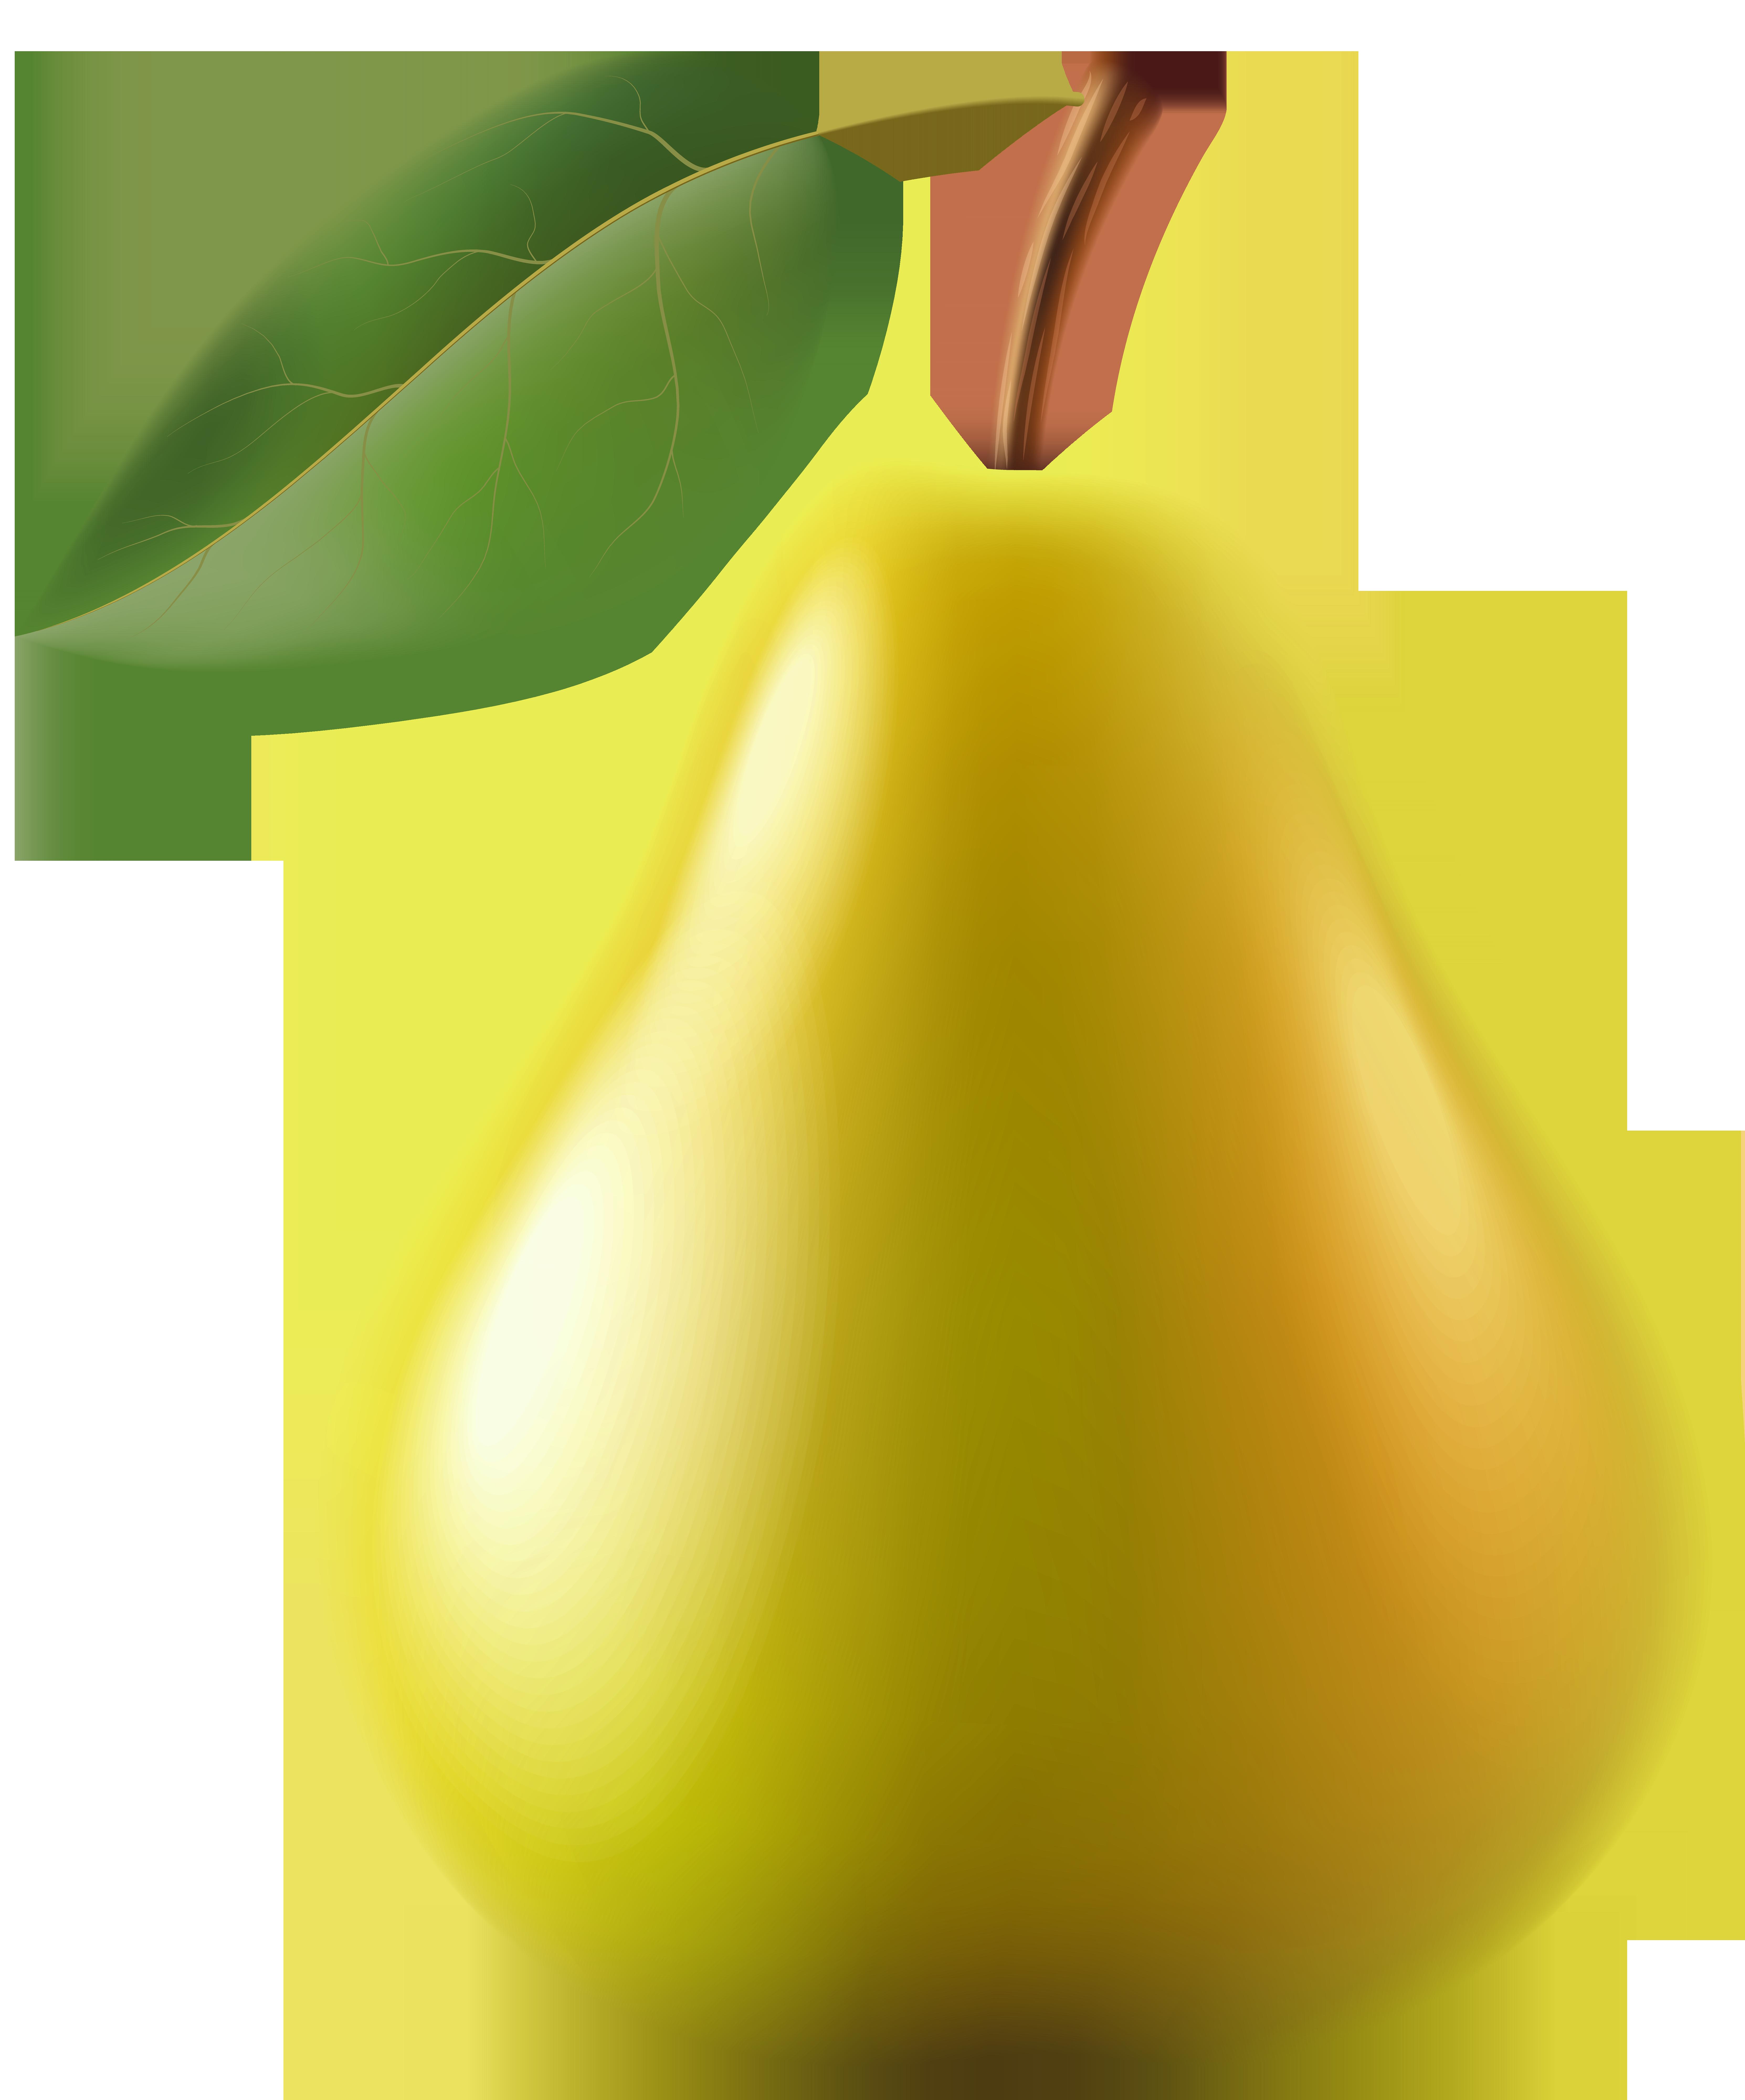 Pear clipart silhouette. Transparent png clip art